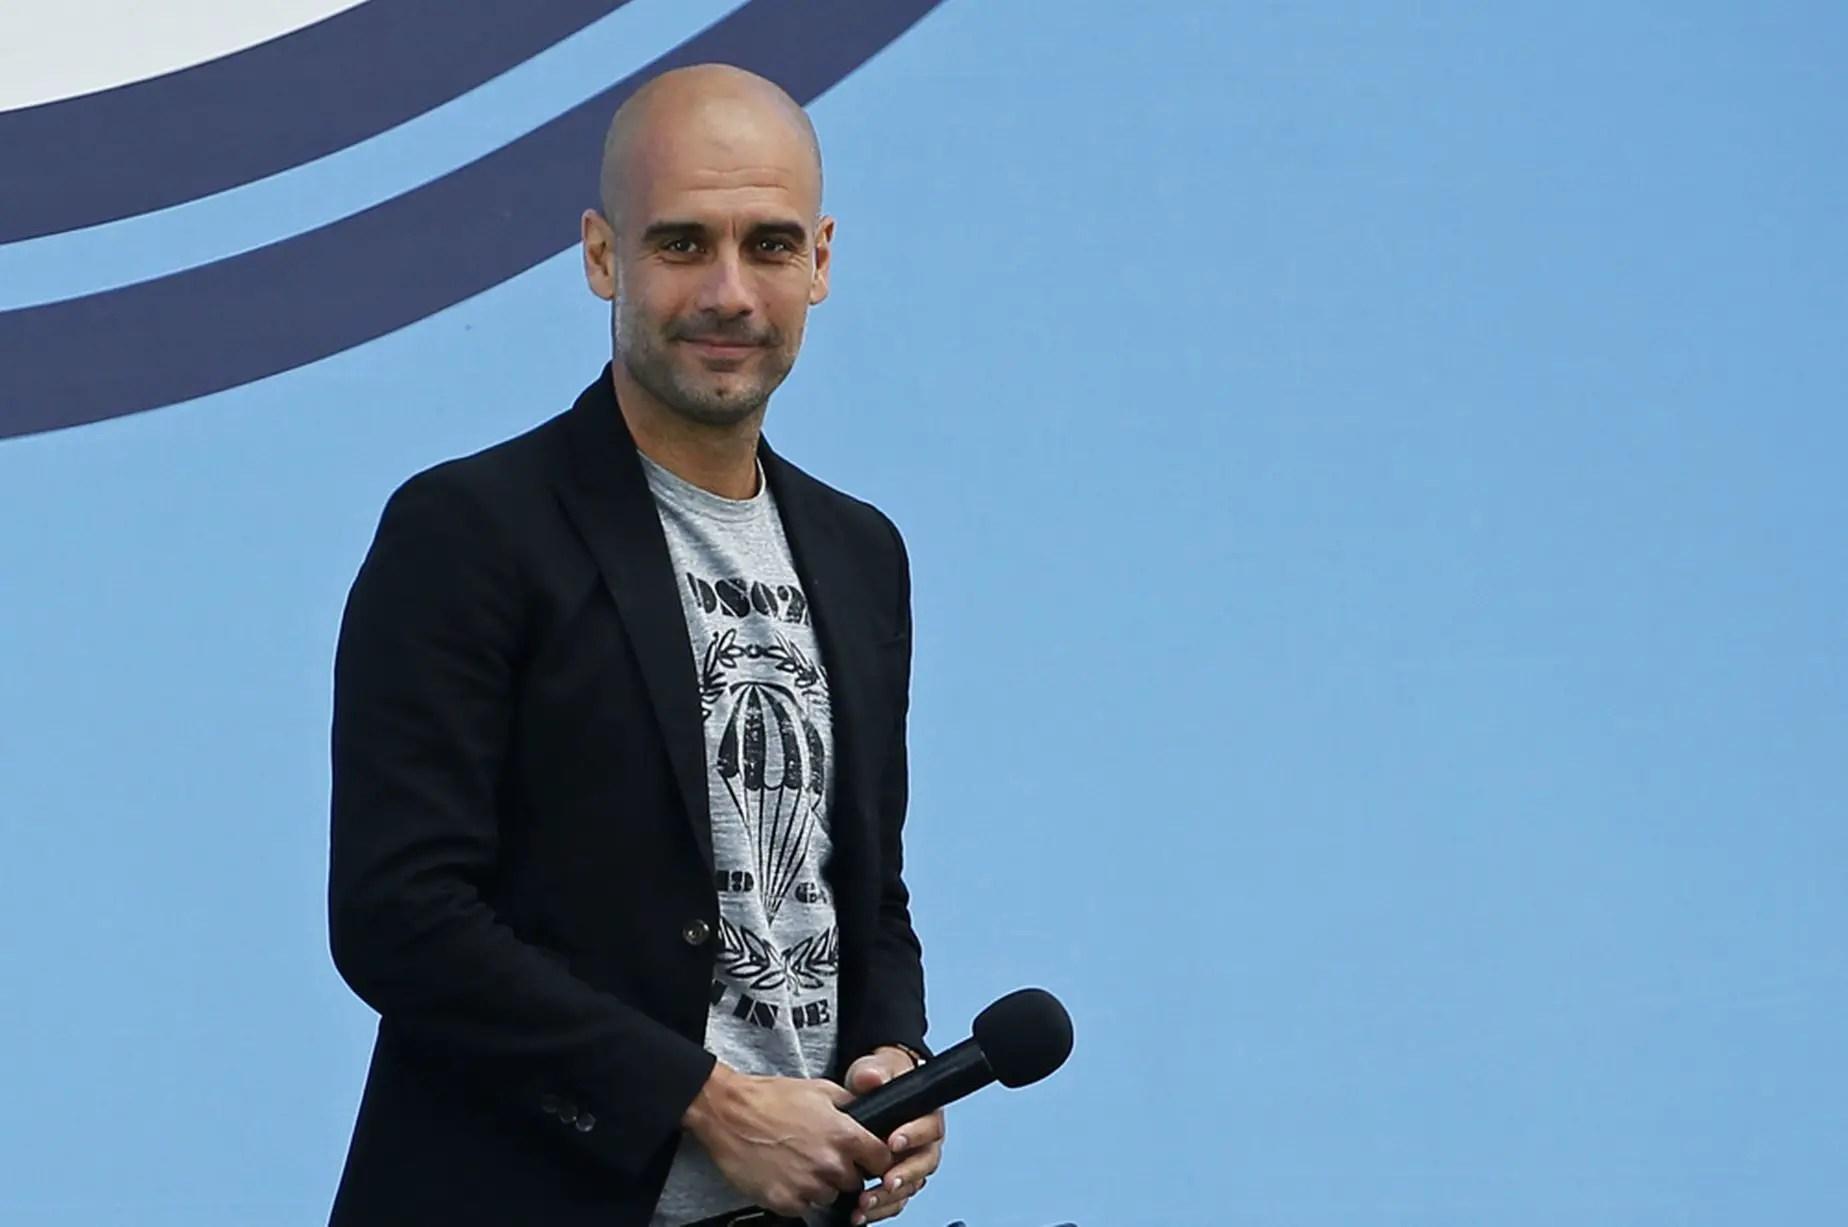 PEP TALK: Guardiola On Mourinho, Conte, Sterling, Toure, Style